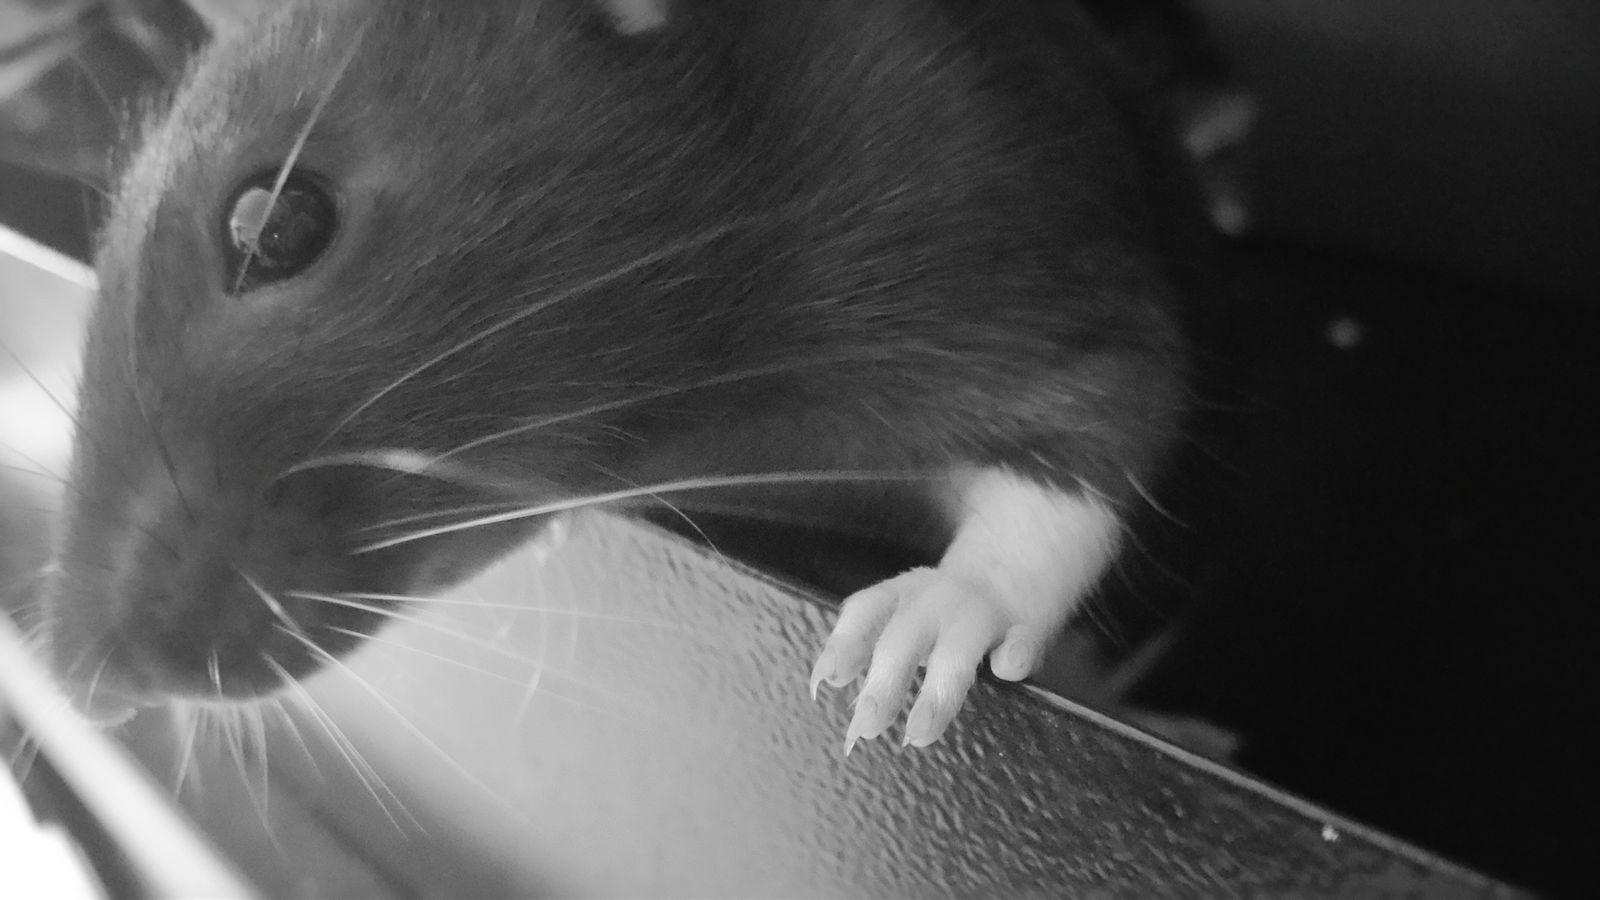 Ratsrule PetRat Kjæledyr Ratlover Ratlove Blackandwhite Pet Photography